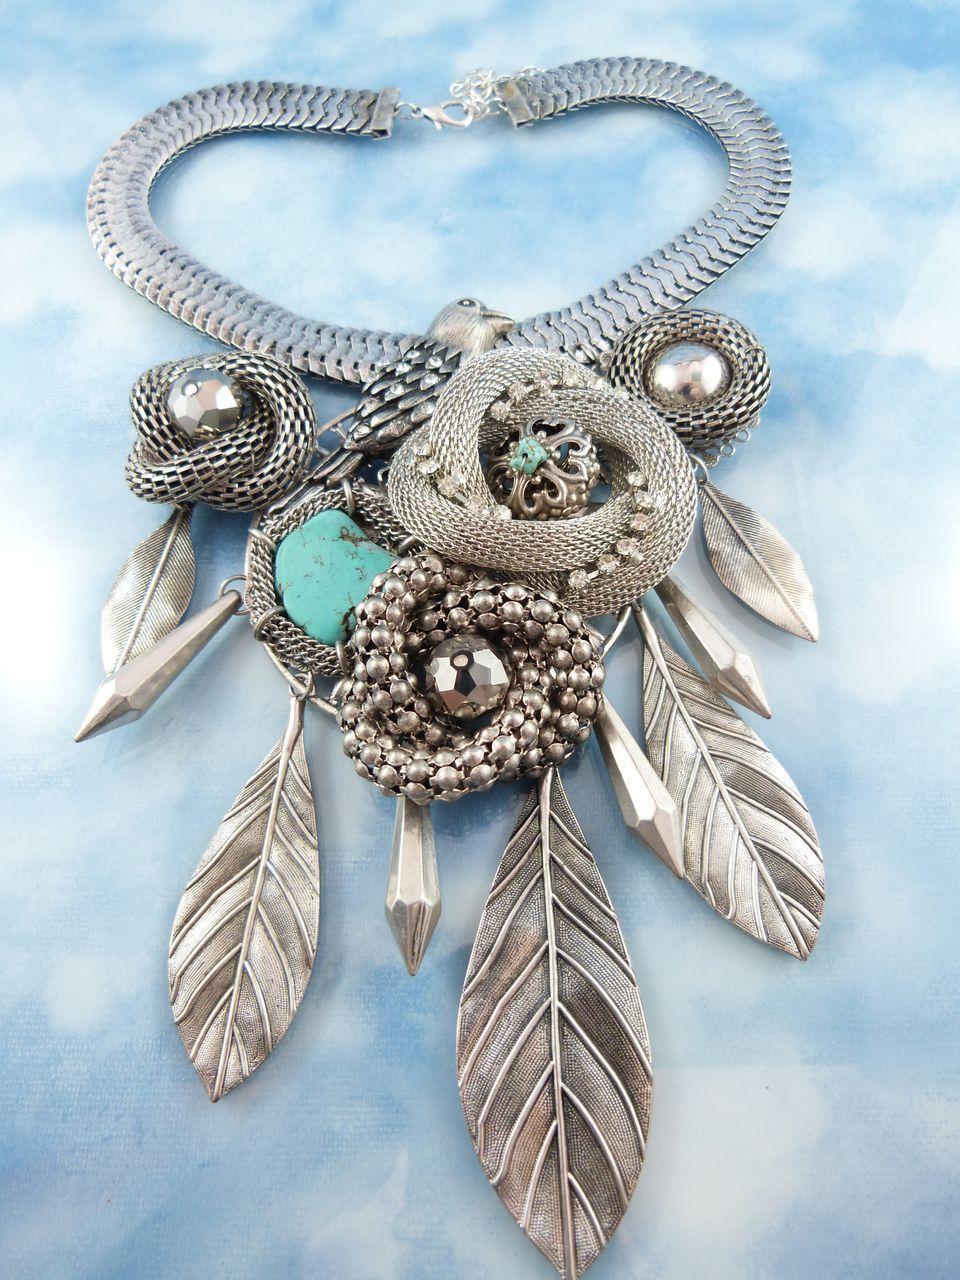 Designer Modernist Bird Sanctuary Silver Tone Crystal Turquoise Statement Runway Necklace